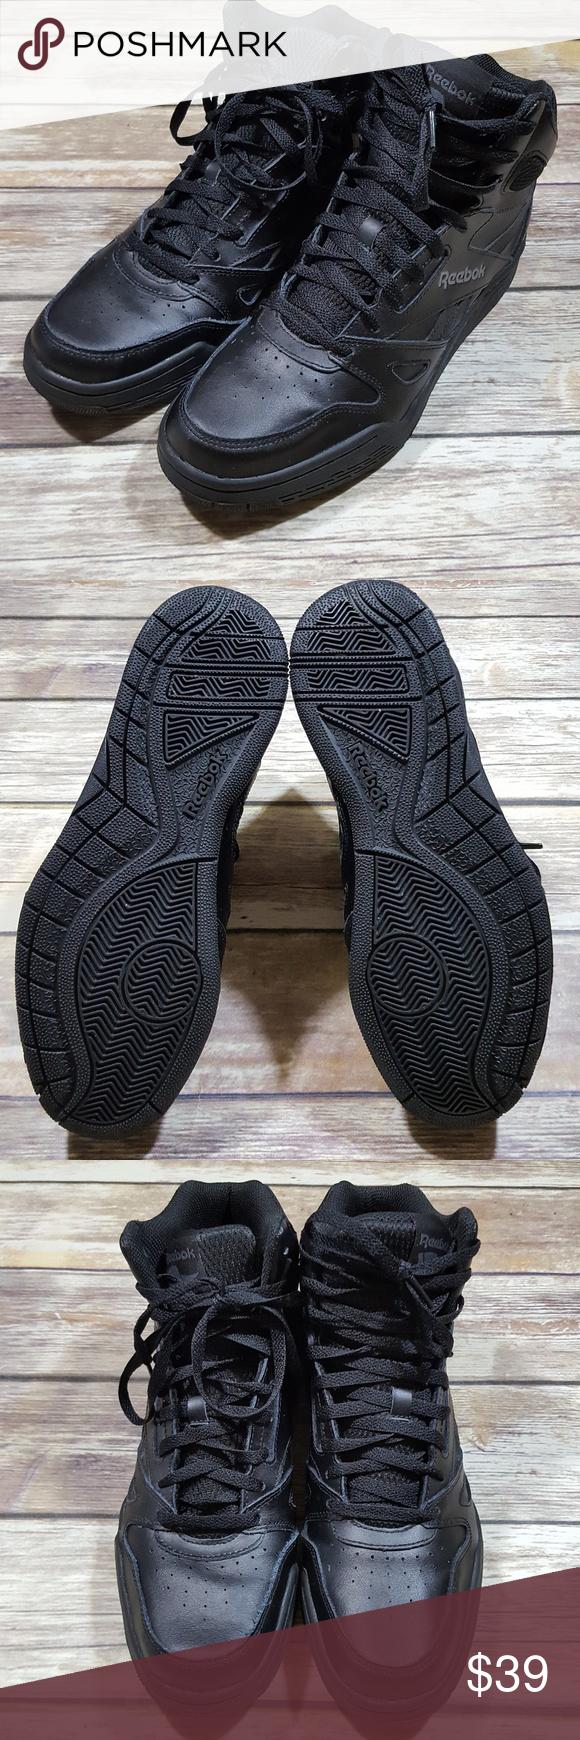 Reebok Men s BB4600 Mid Black Basketball Shoes Reebok Men s Size 10.5M  BB4600 Mid Solid Black 8fb89e0c7